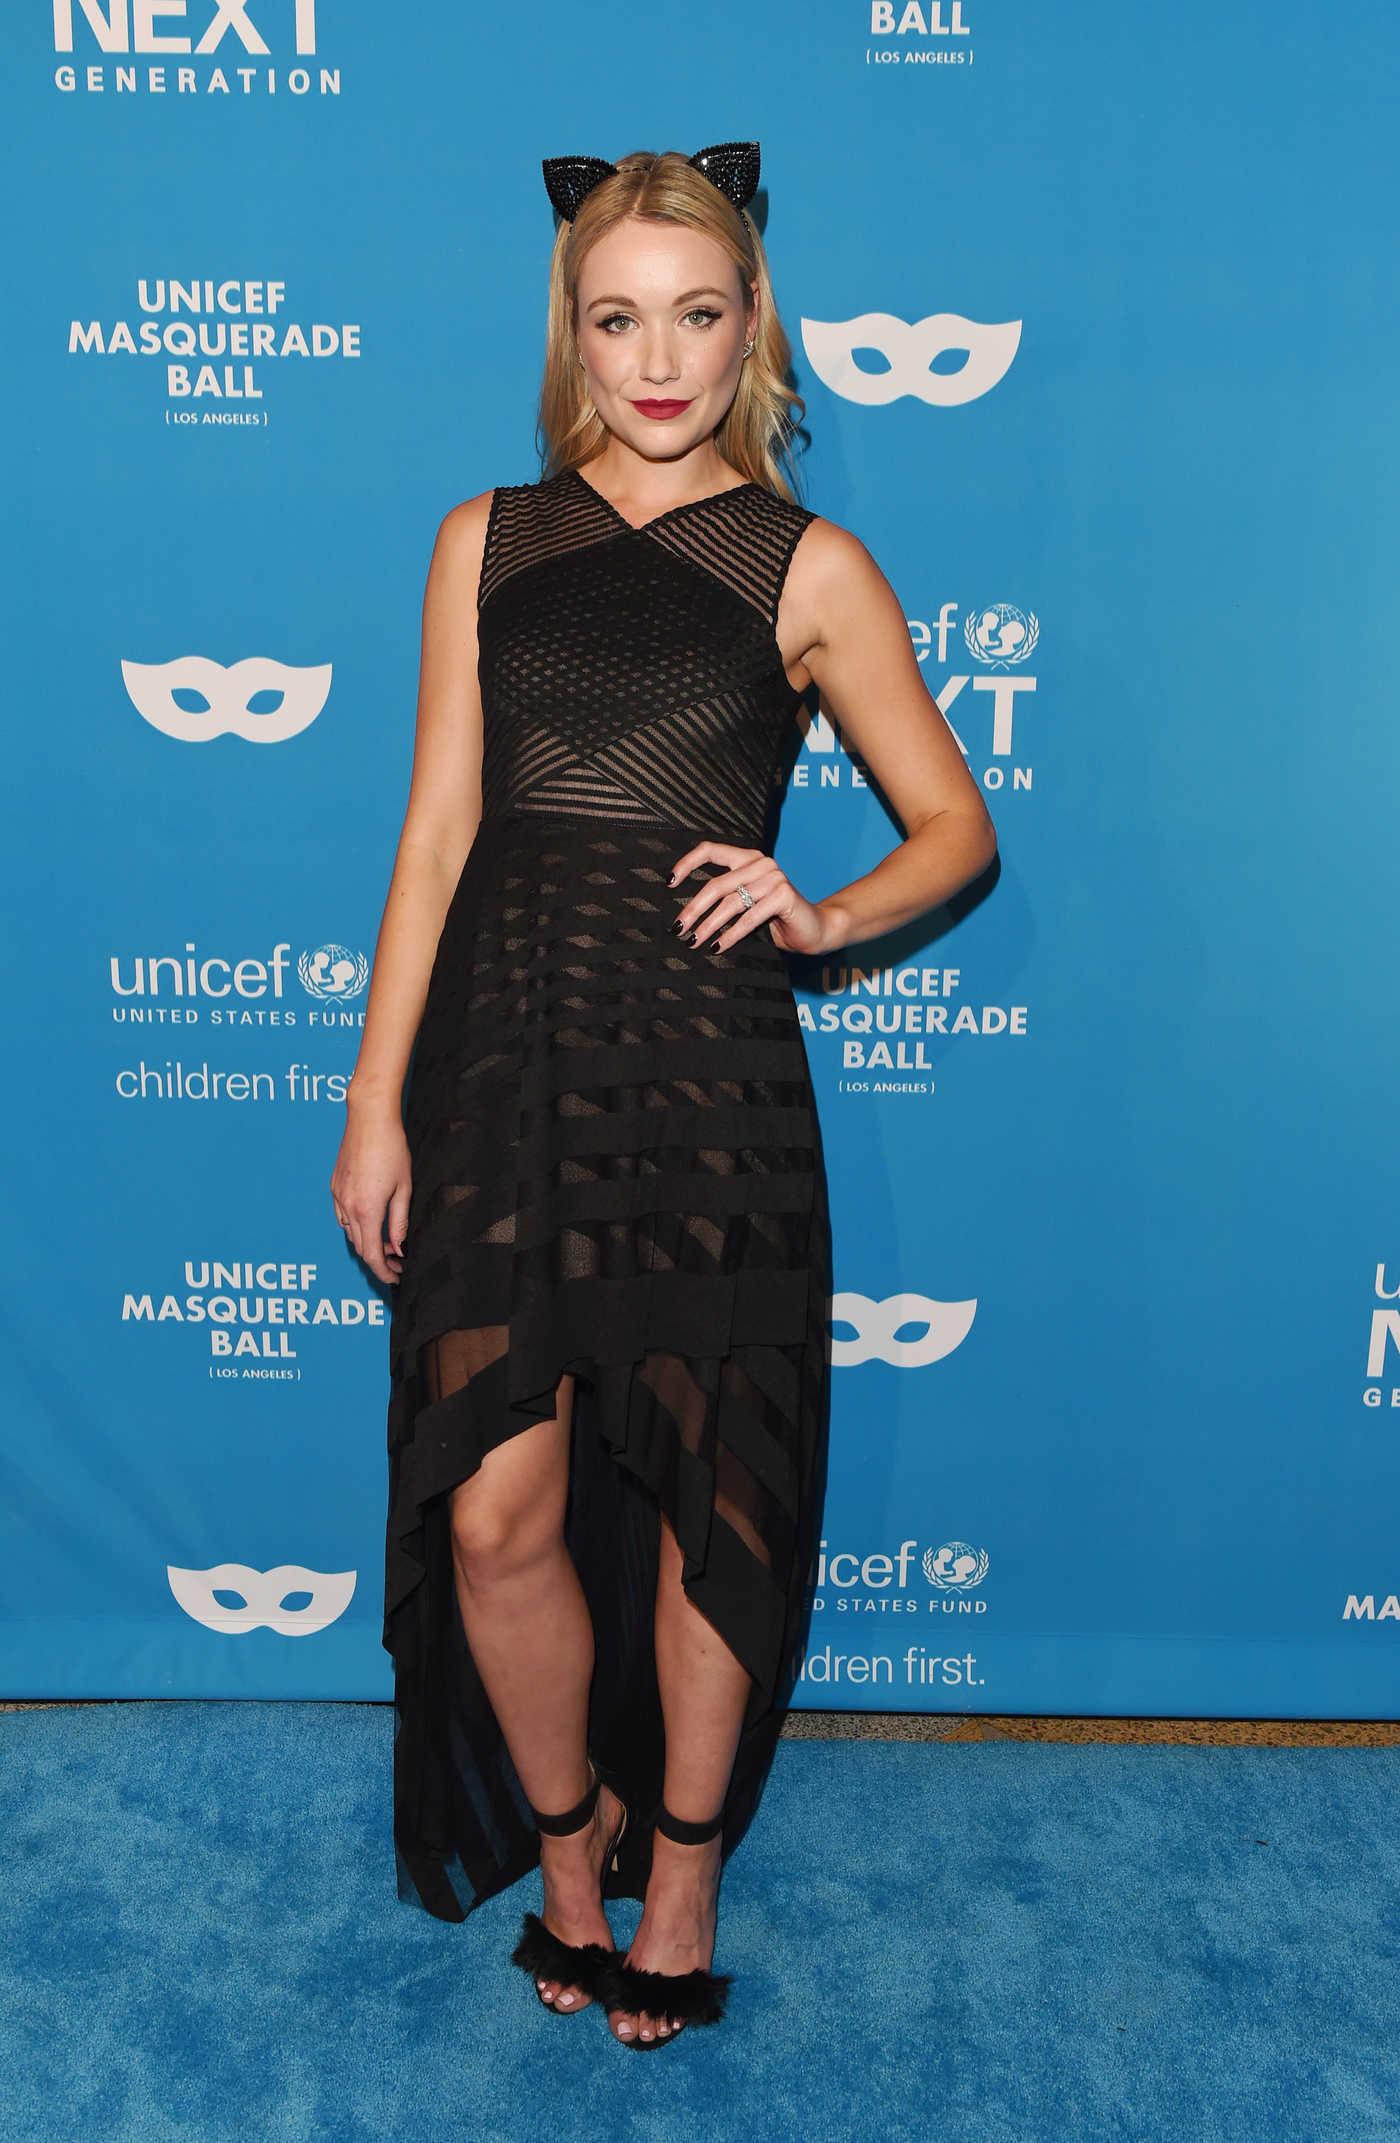 Katrina Bowden at the 2016 UNICEF Masquerade Ball in Los Angeles 10/27/2016